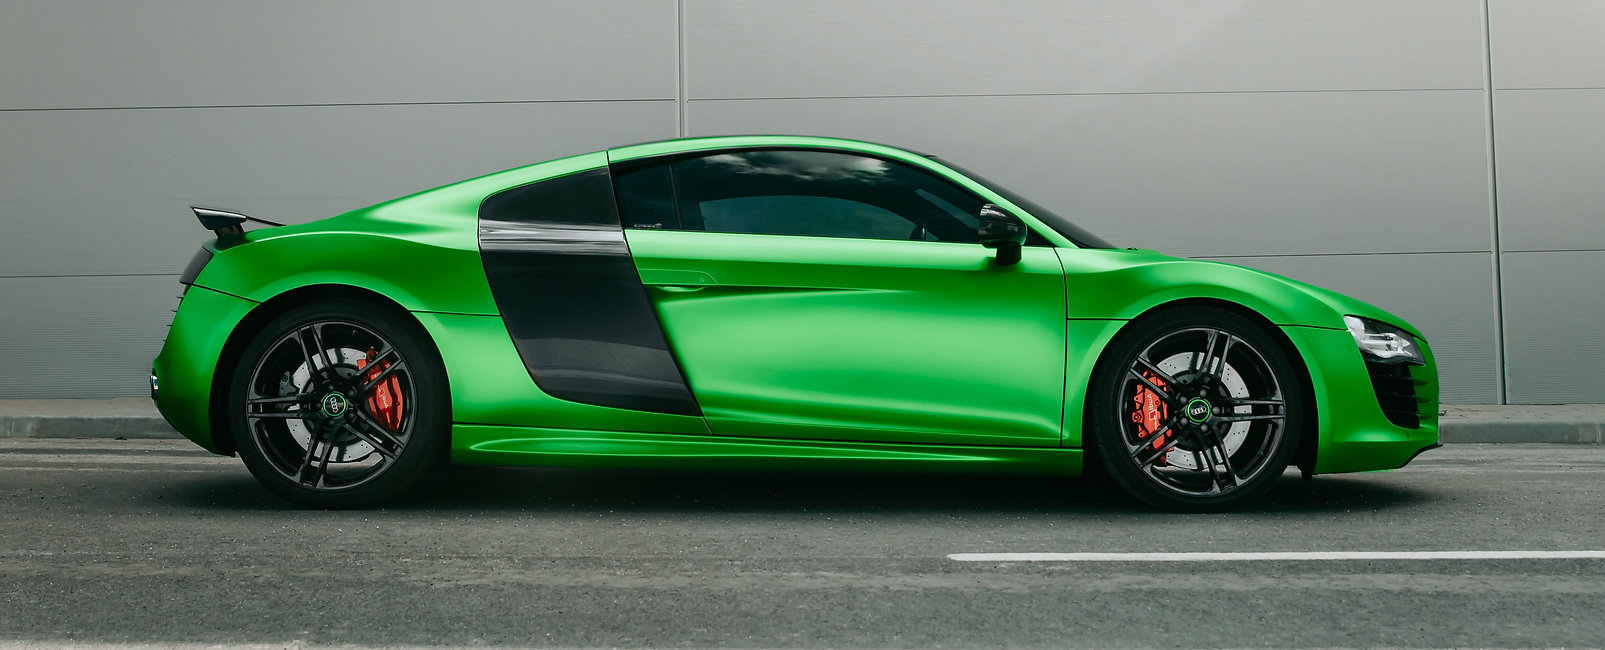 Green-car_opt.jpg